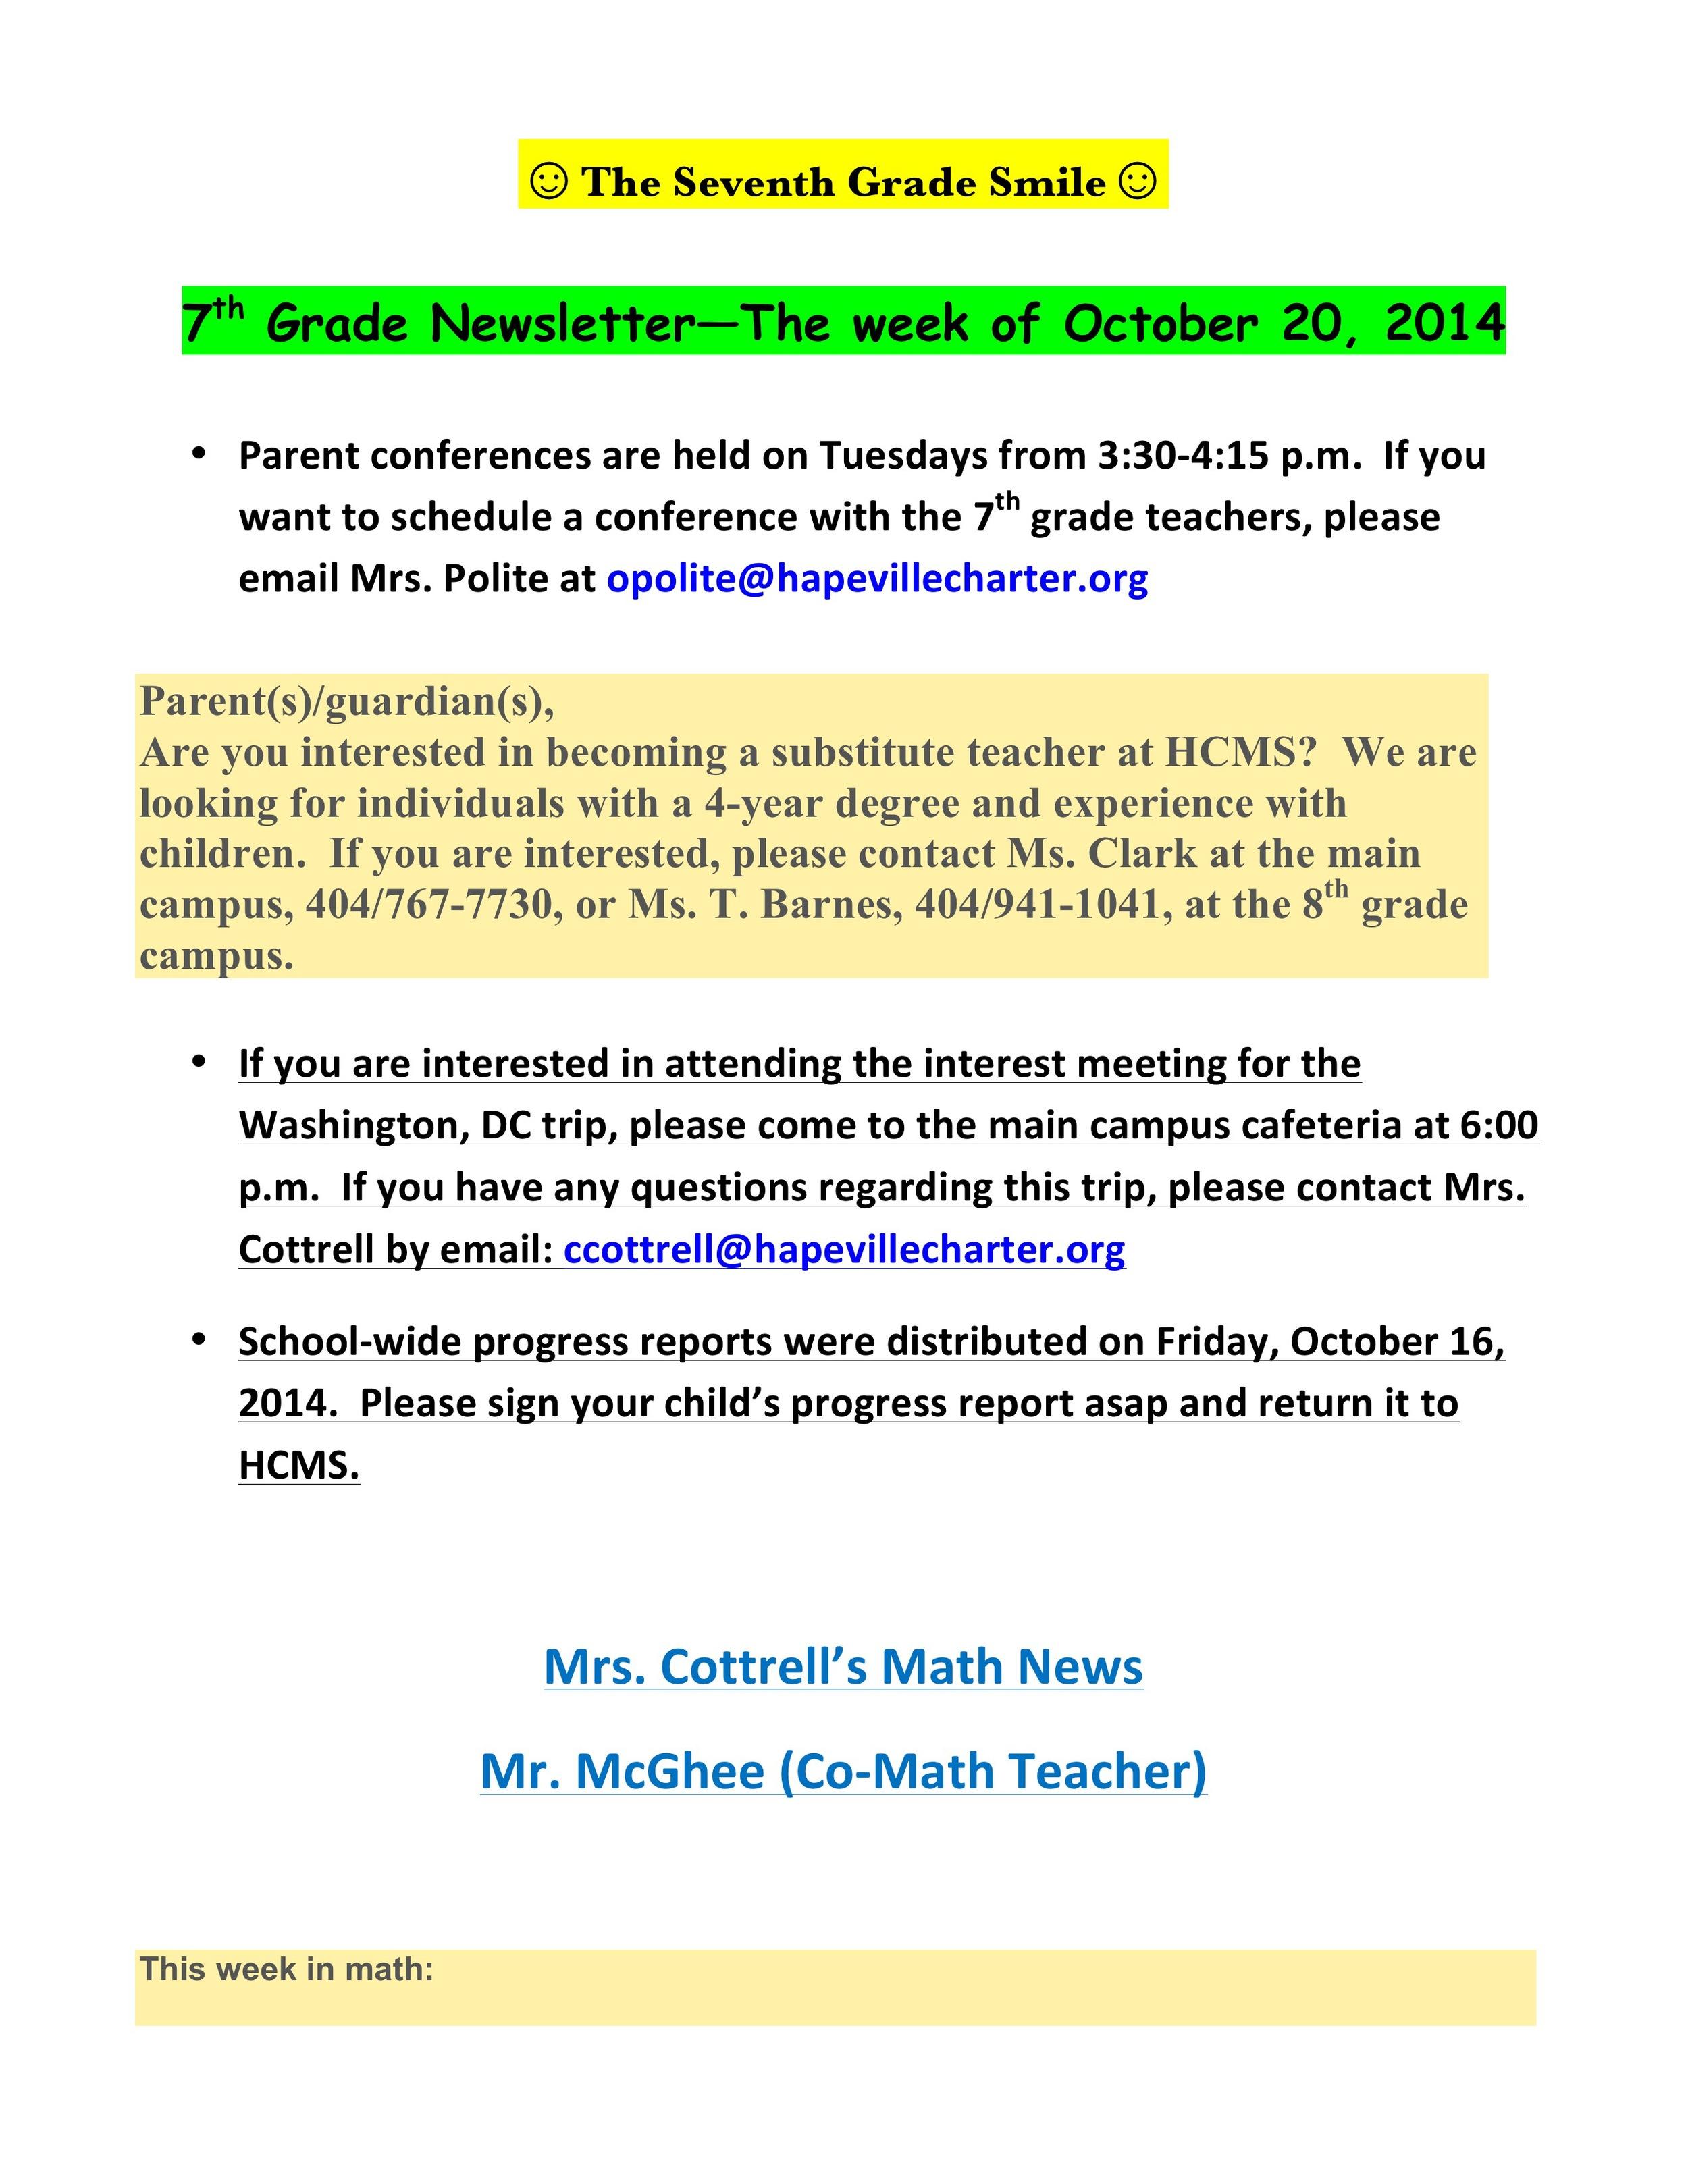 Newsletter Image7th grade 10-20.jpeg